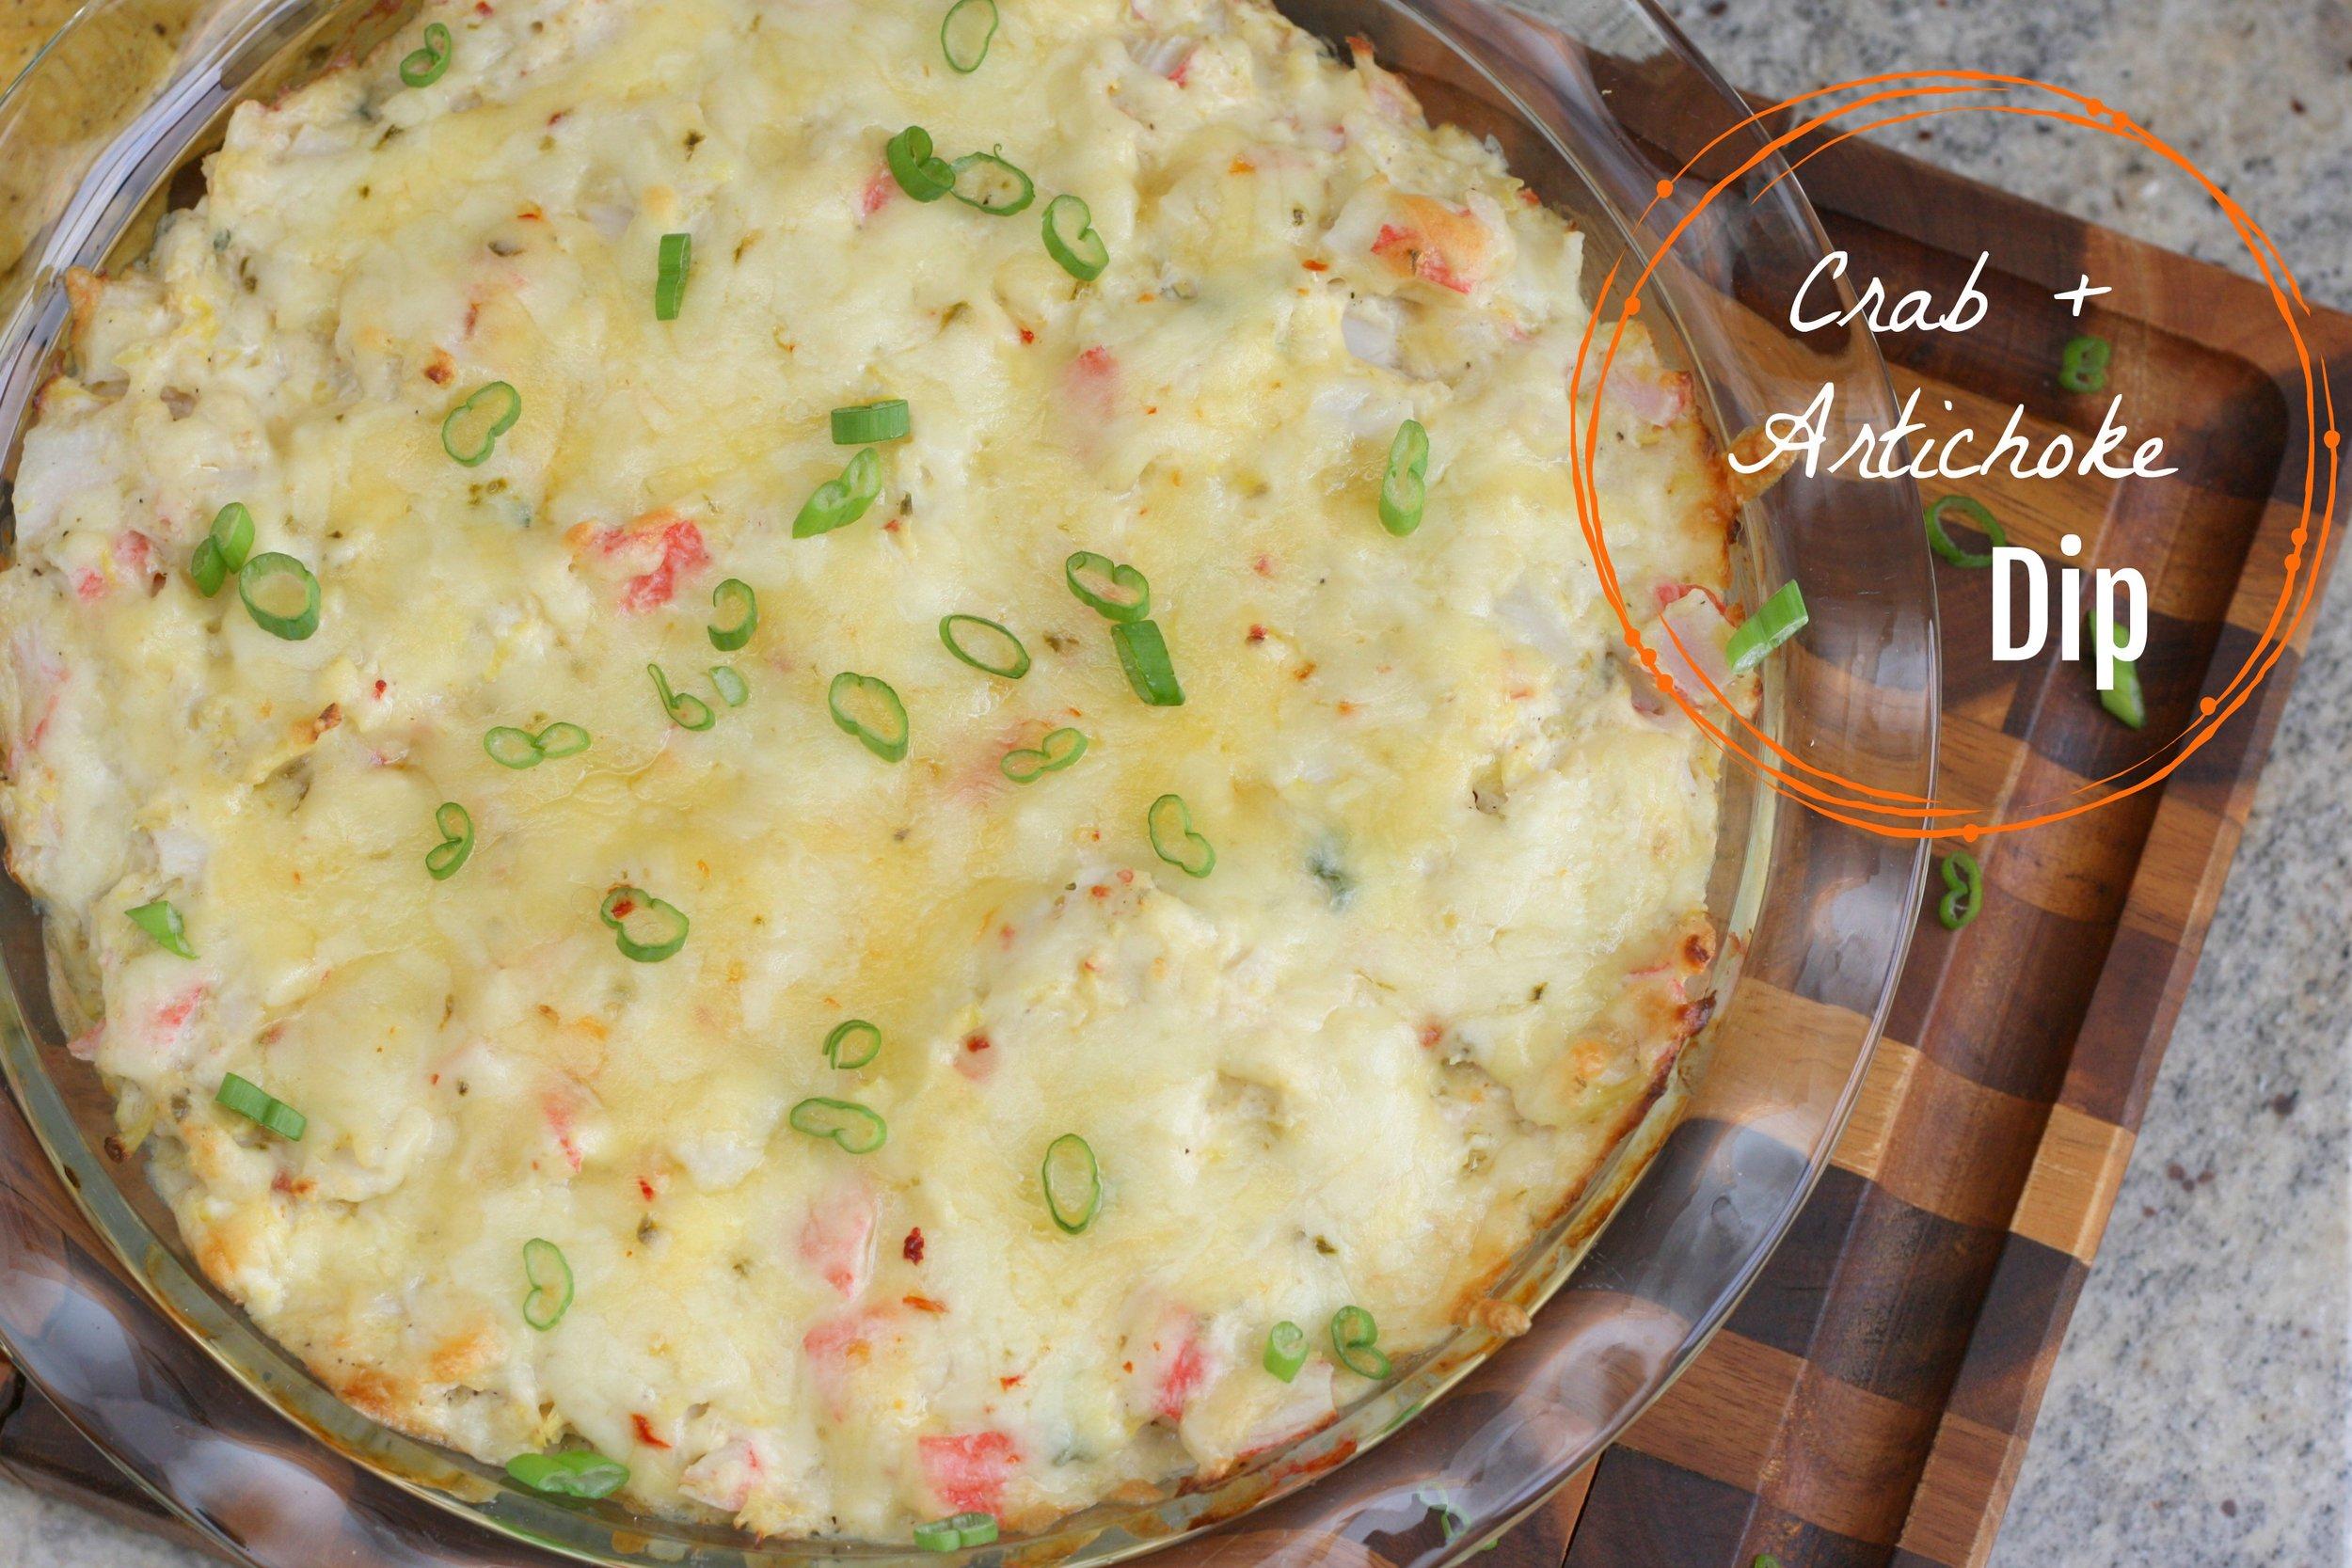 Crab & Artichoke Dip1-text.jpg